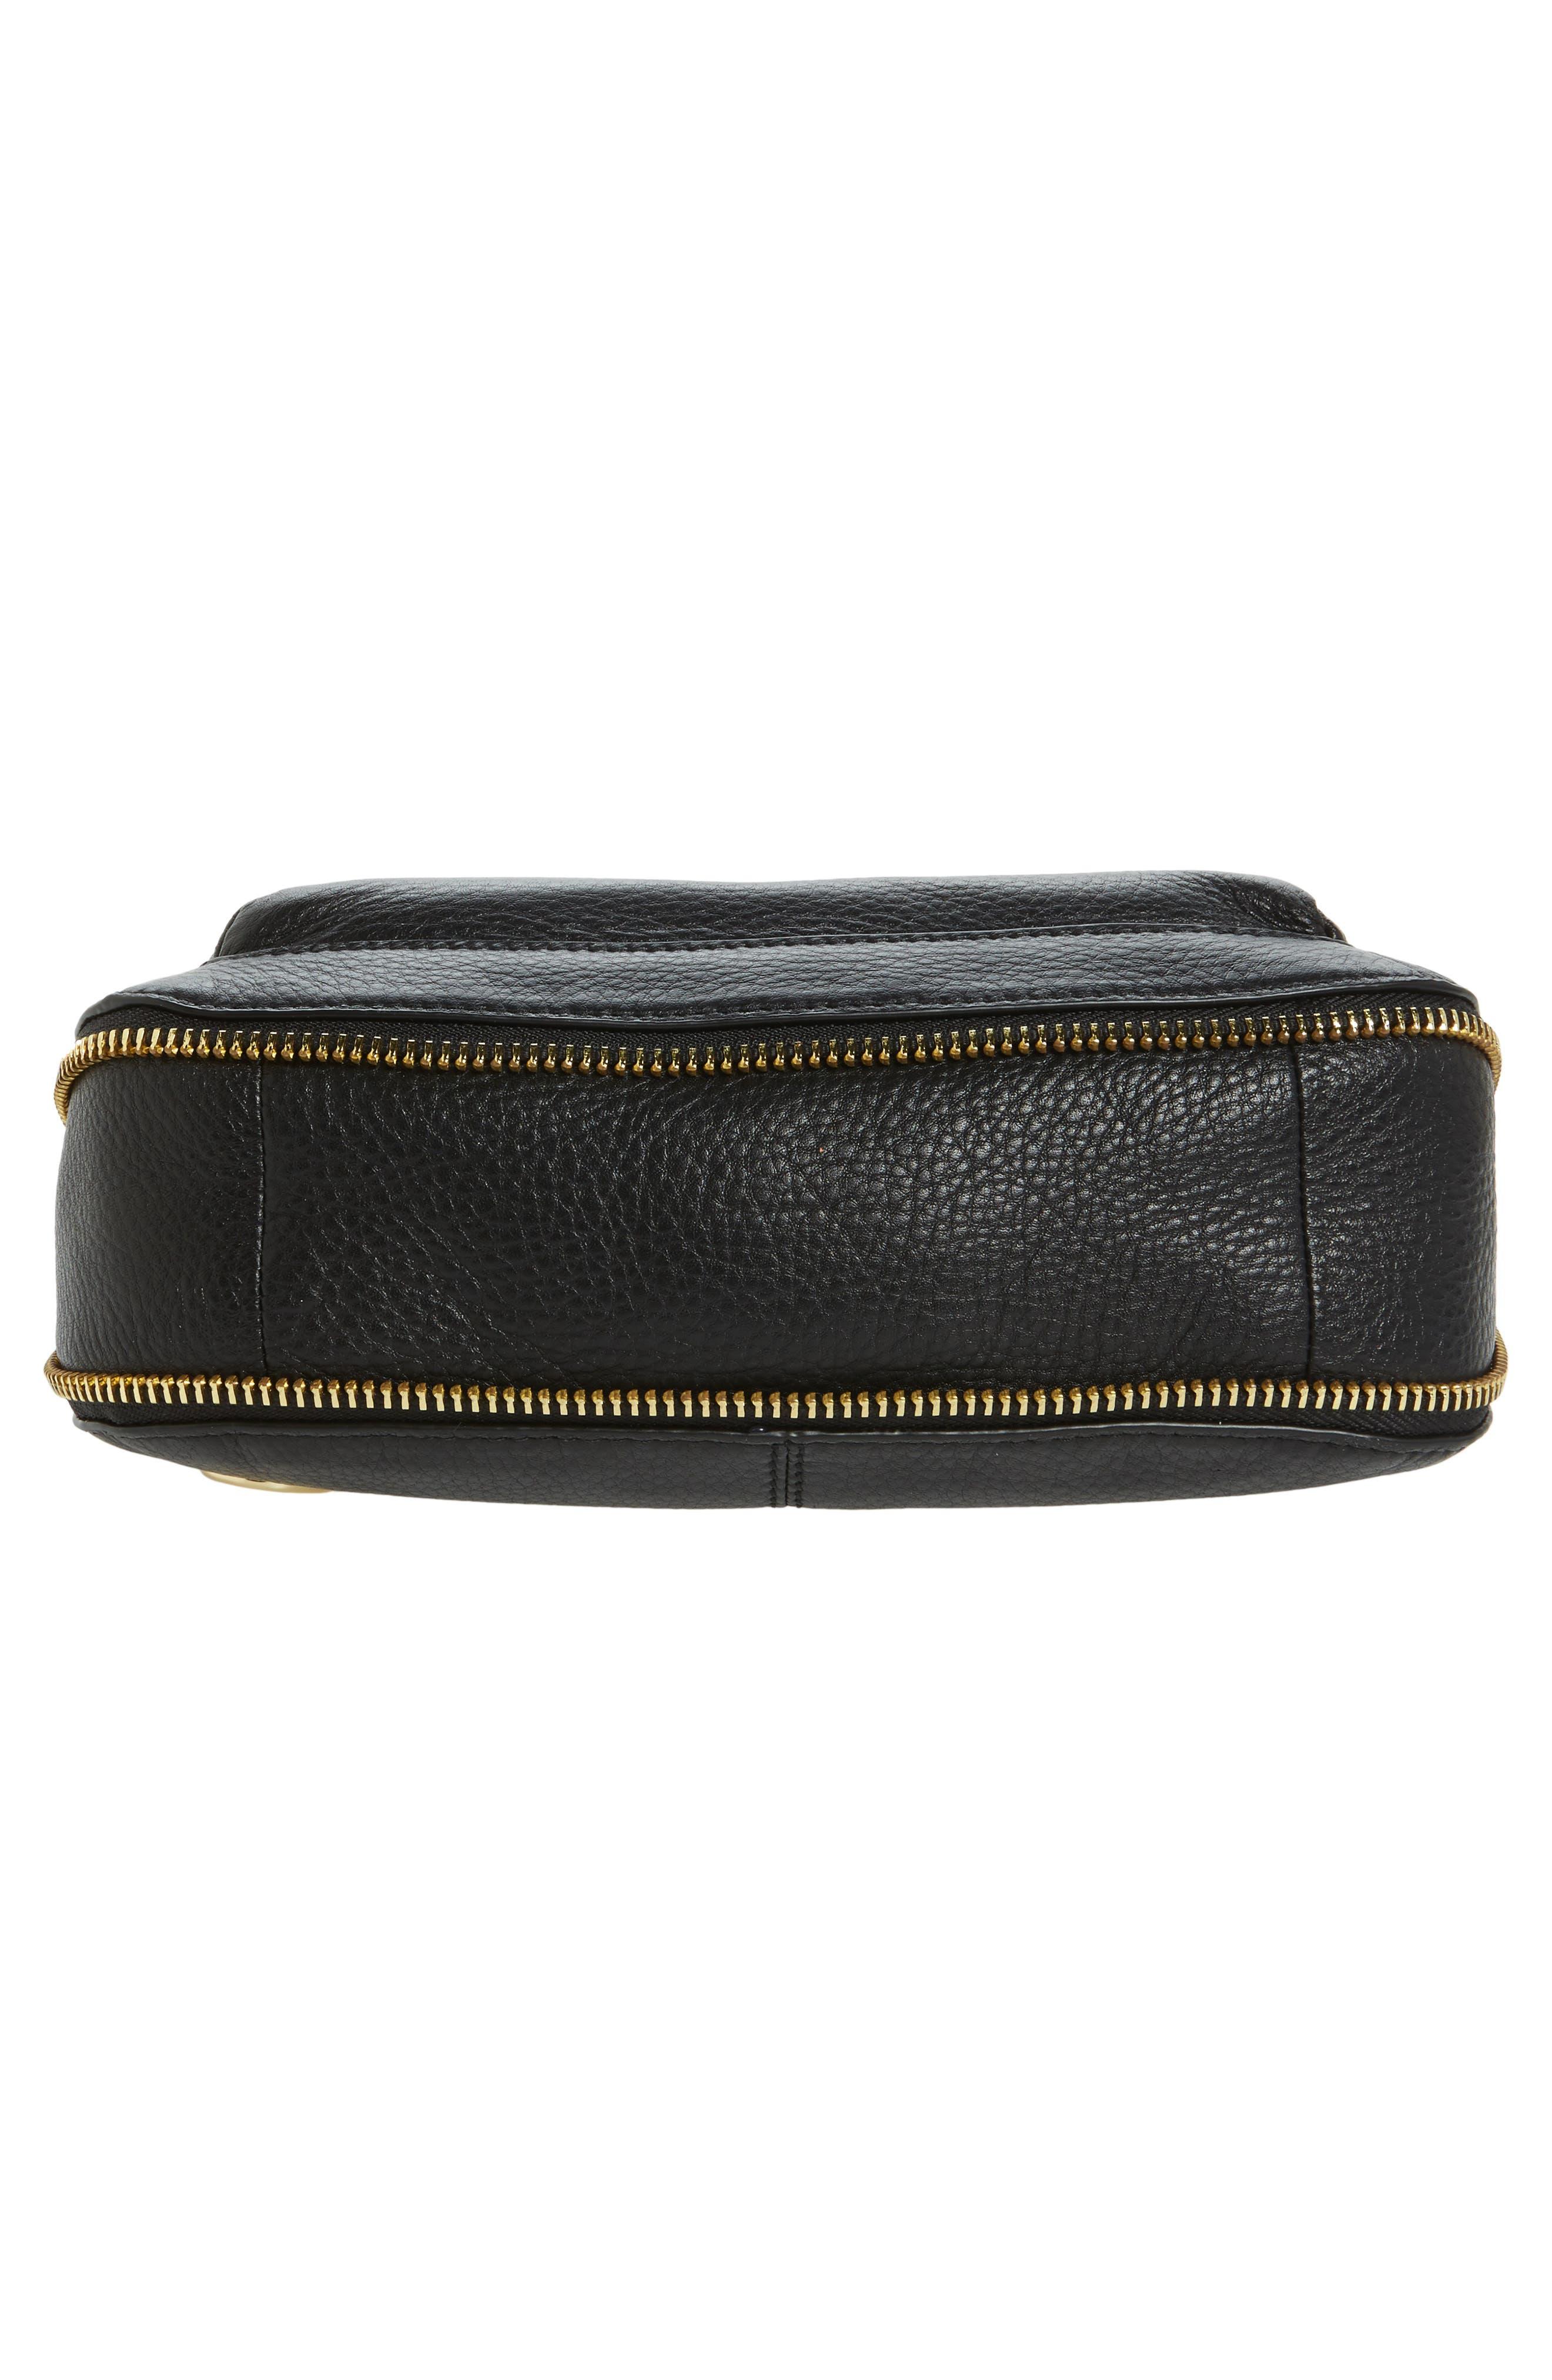 Adina Leather Crossbody Bag,                             Alternate thumbnail 6, color,                             001